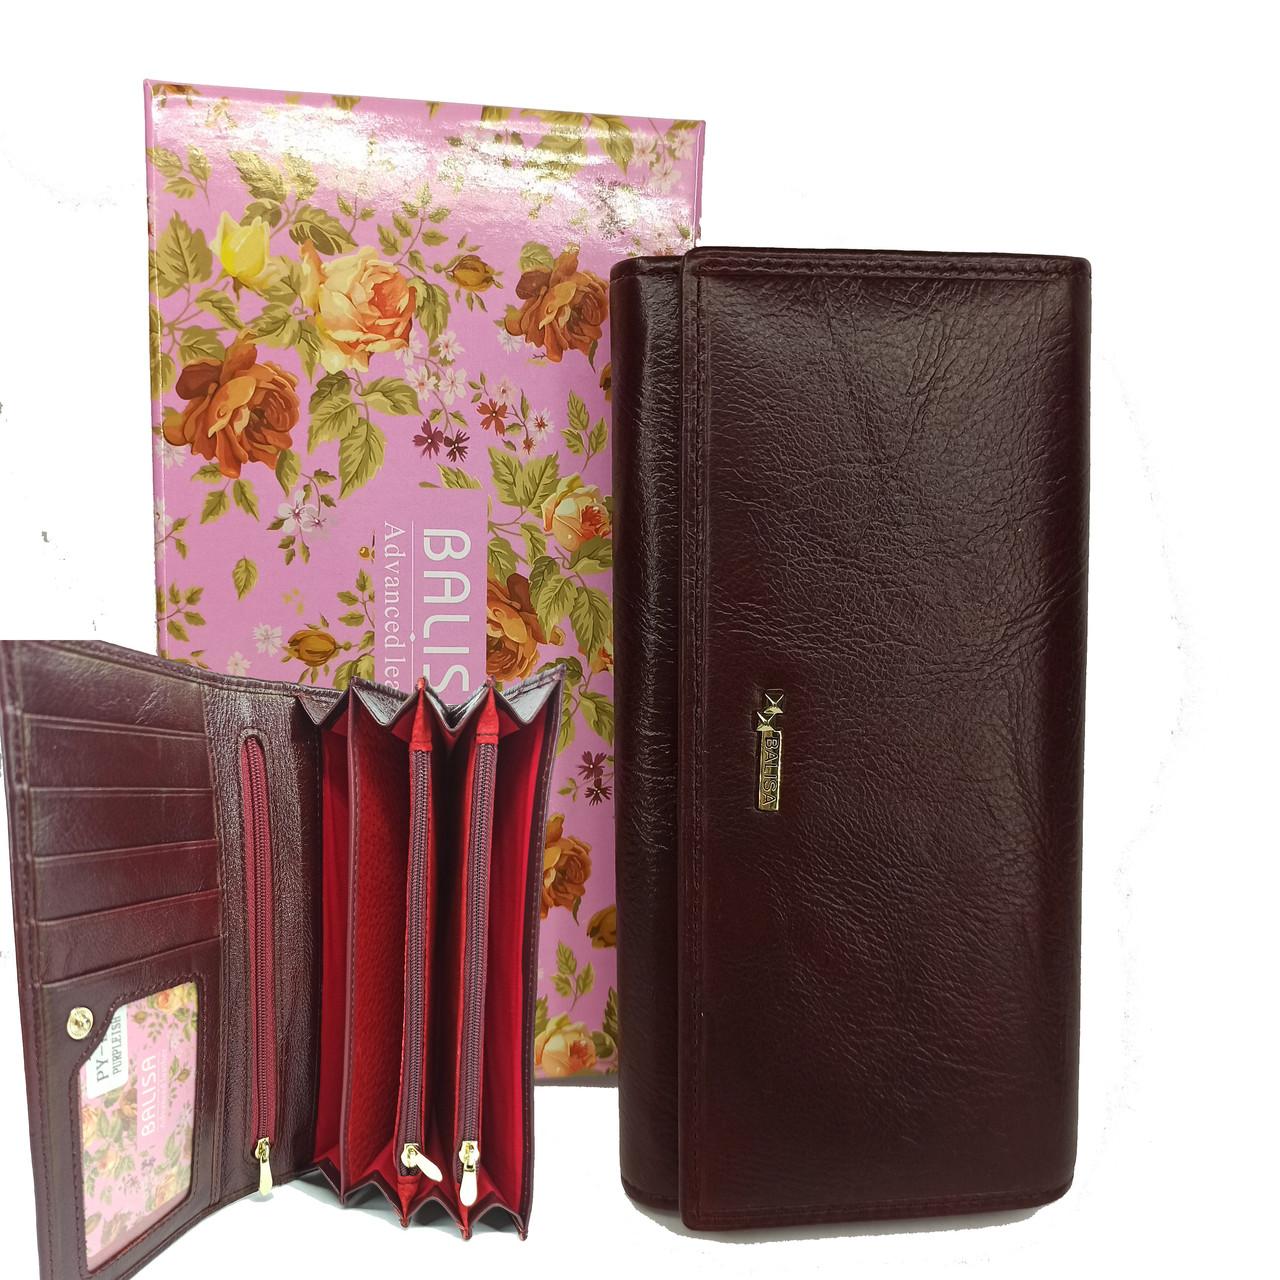 Класичний шкіряний жіночий гаманець / Классический кожаный женский кошелек Balisa PY-D115 red